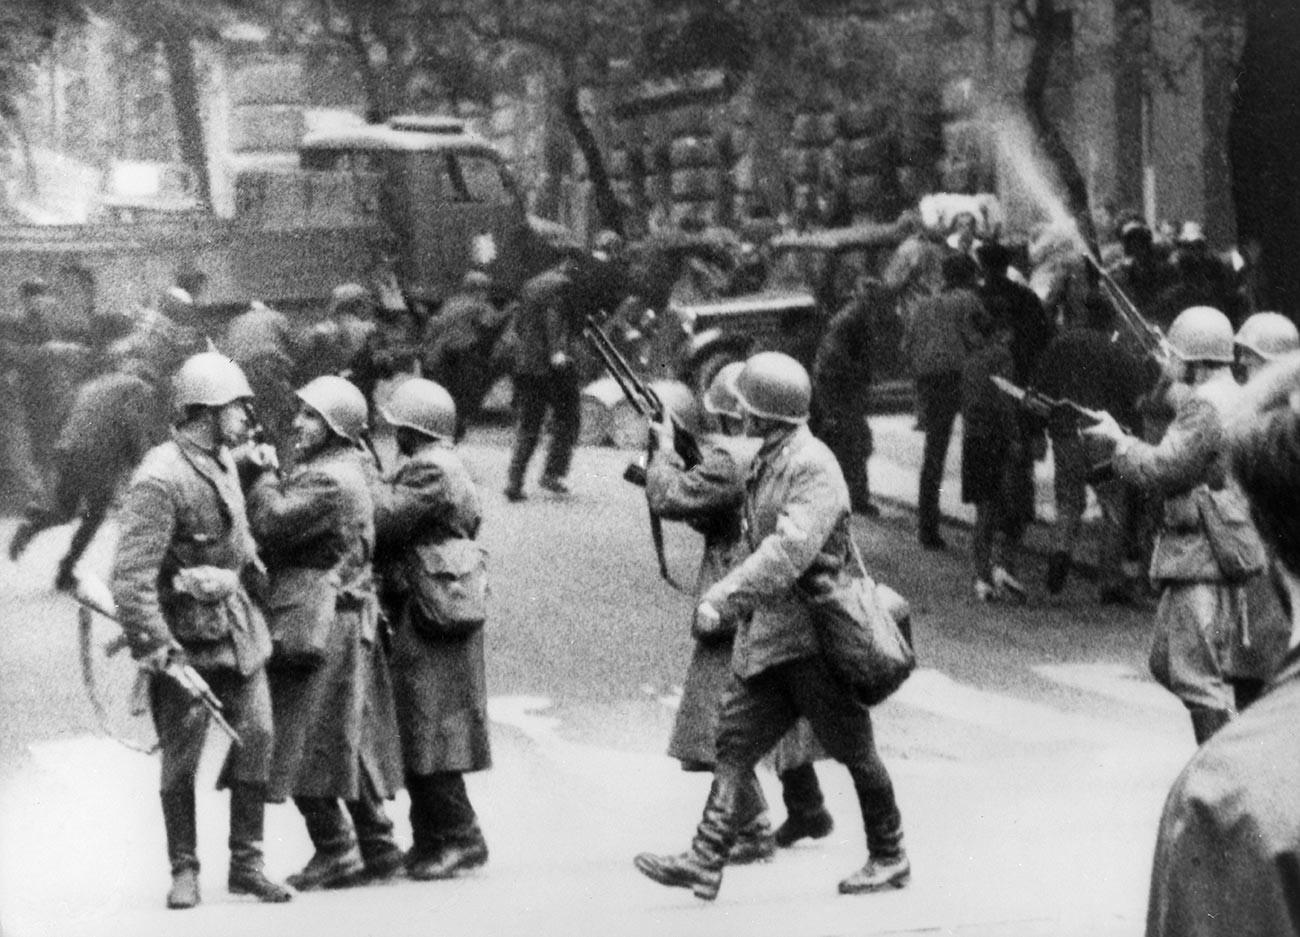 Troops of the Warsaw Treaty Organization in Prague, 1968.